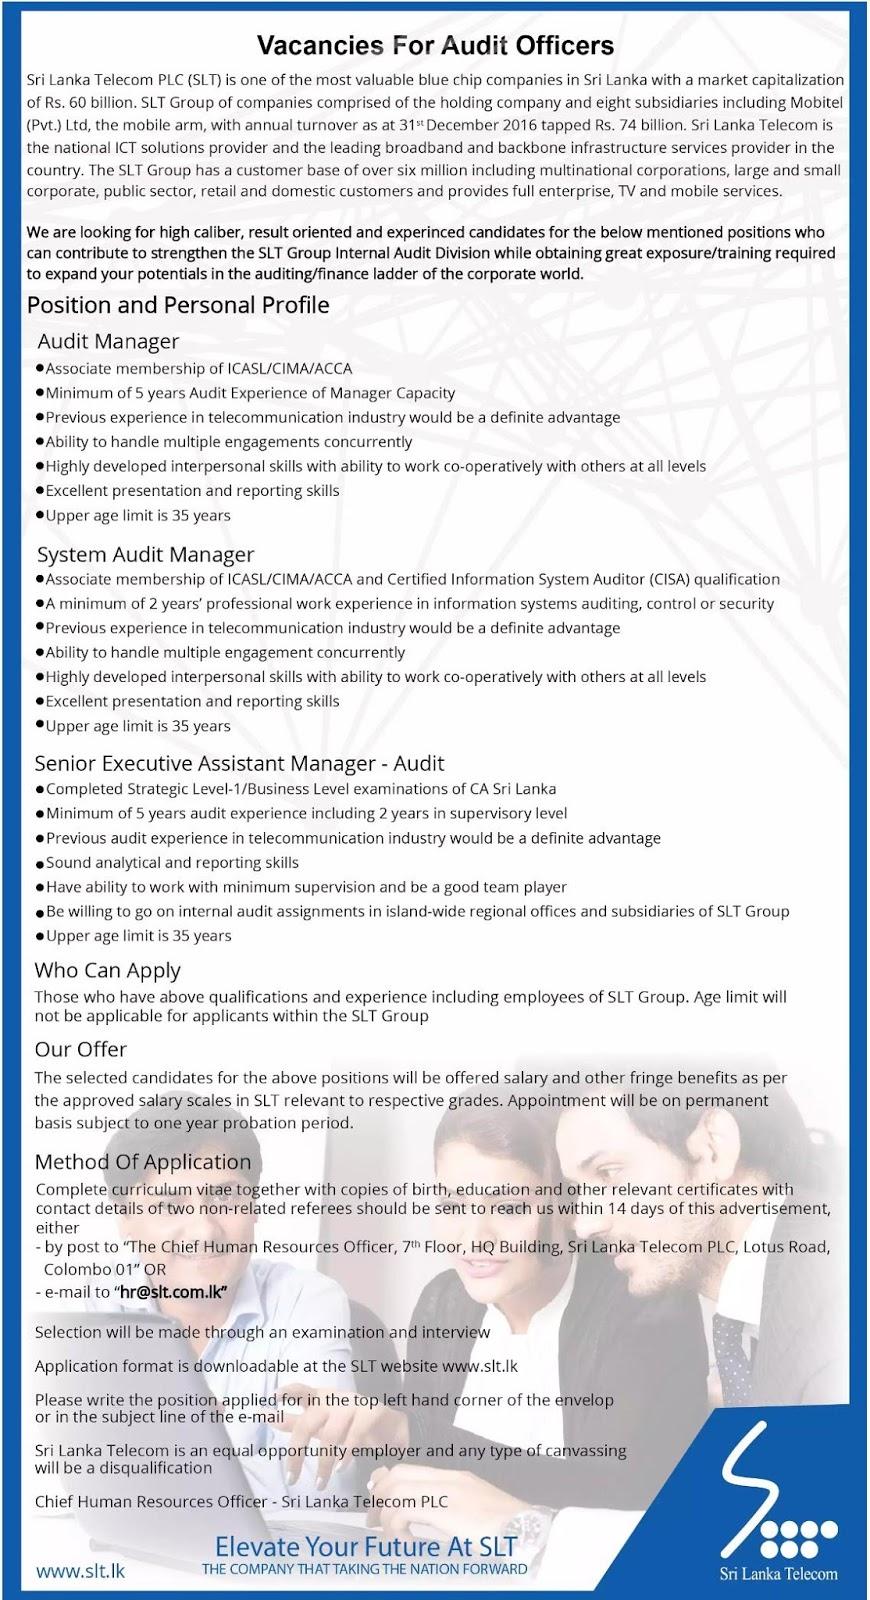 Sri Lanka Telecom Audit Vacancies Gazette Sri Lanka ගැසට් Lk